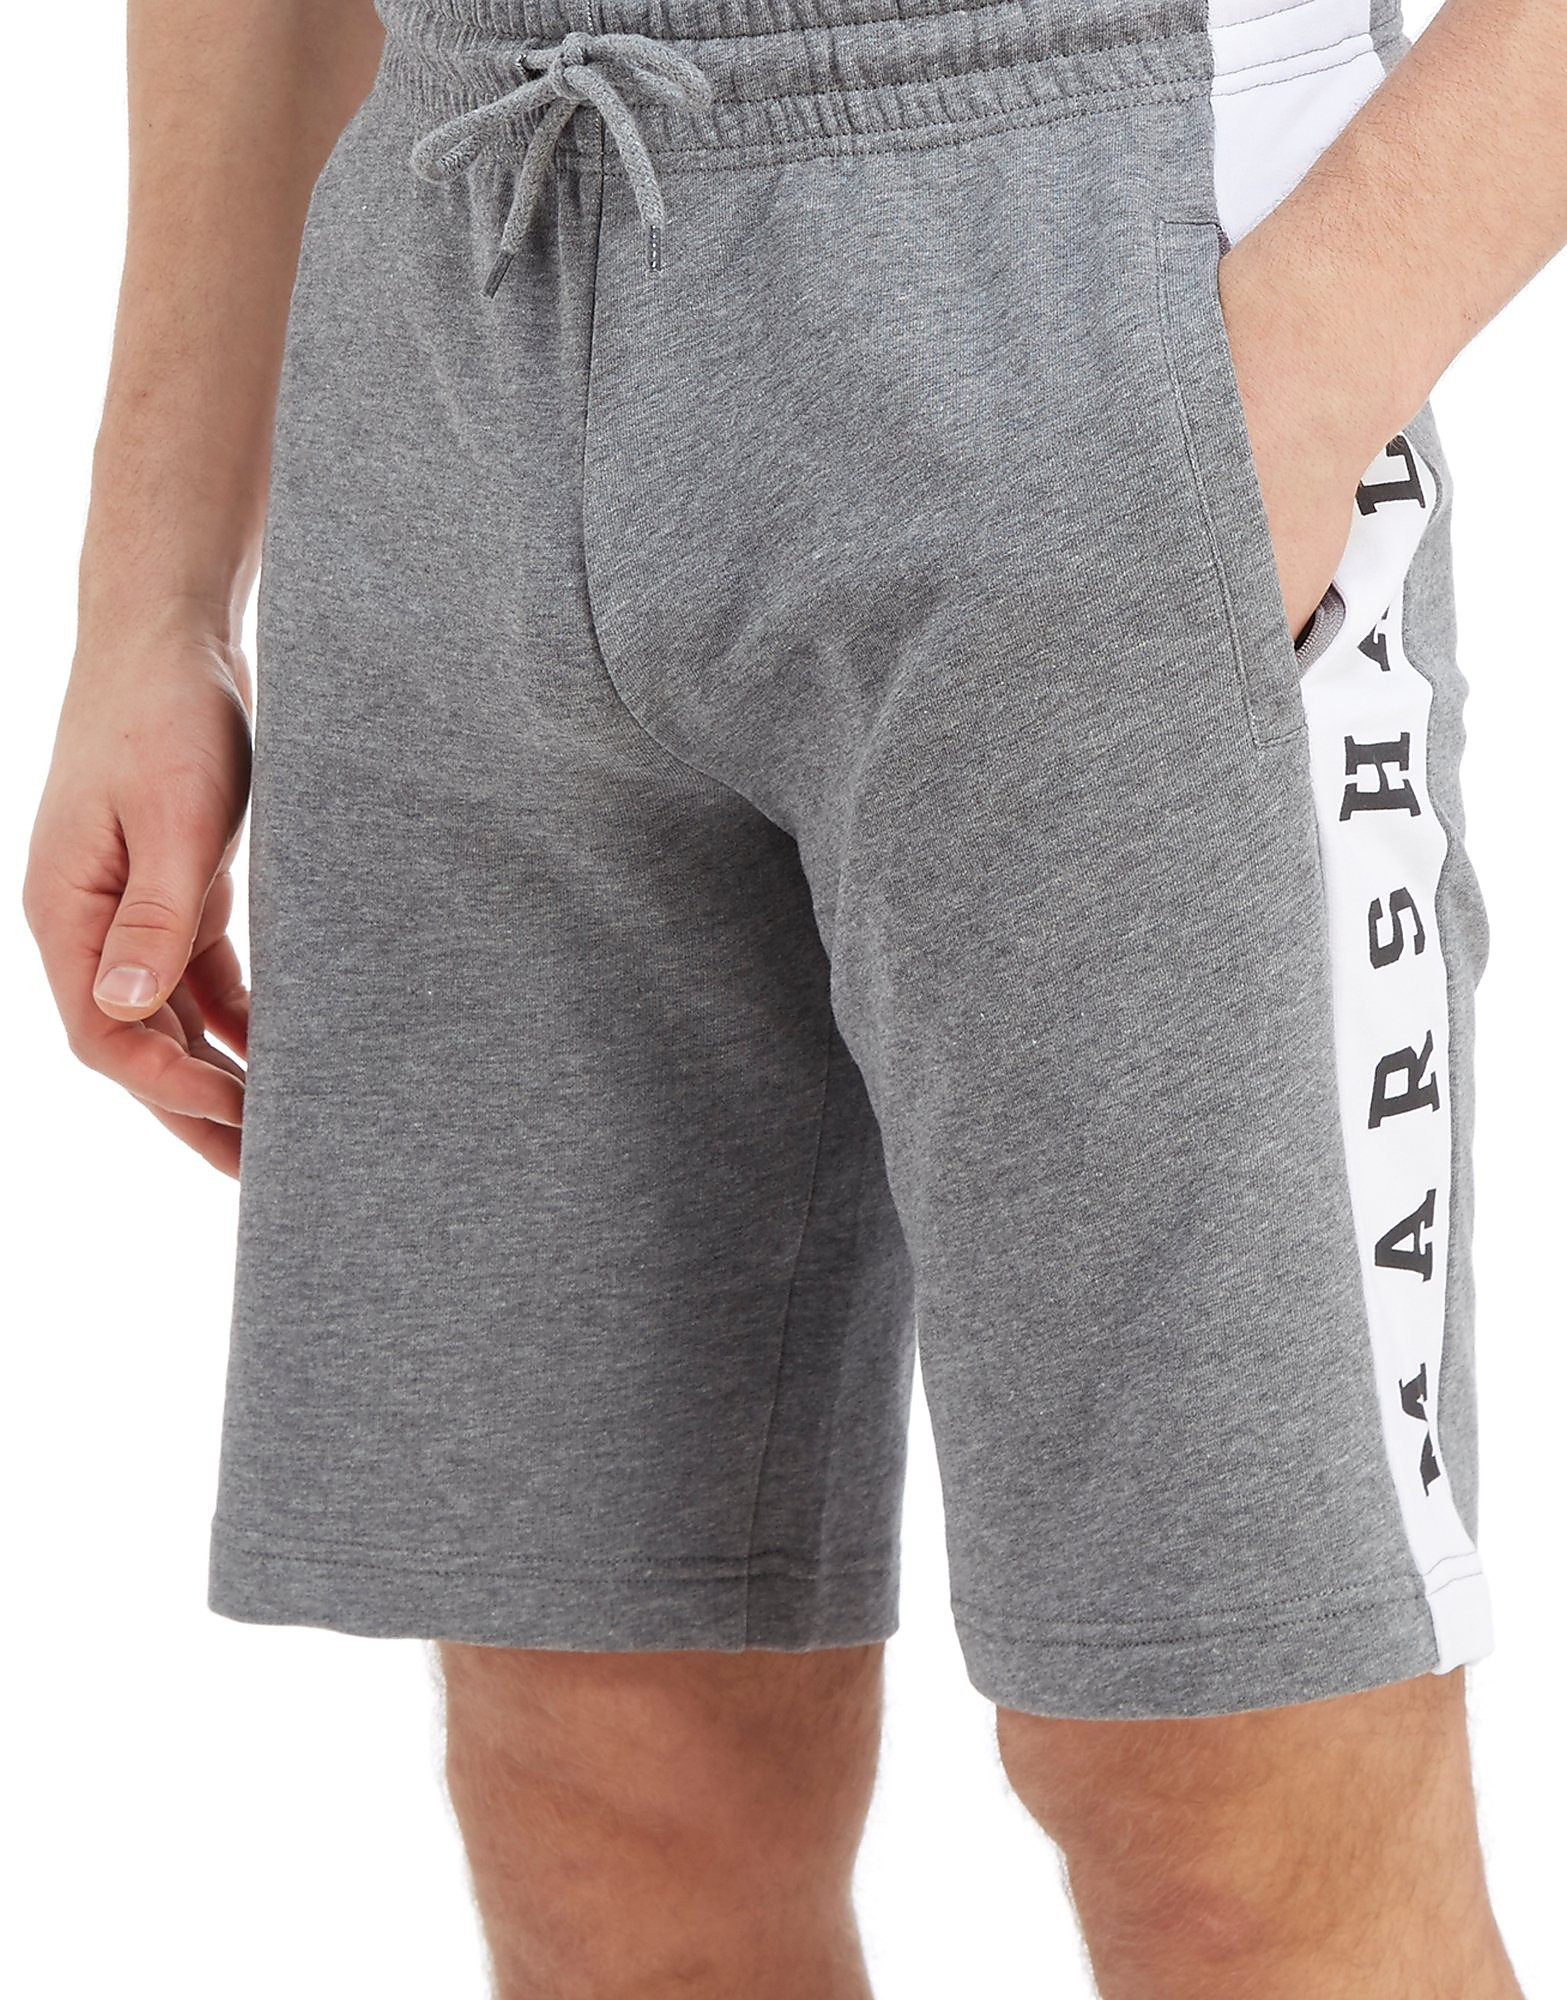 Franklin & Marshall Side Panel Branded Shorts